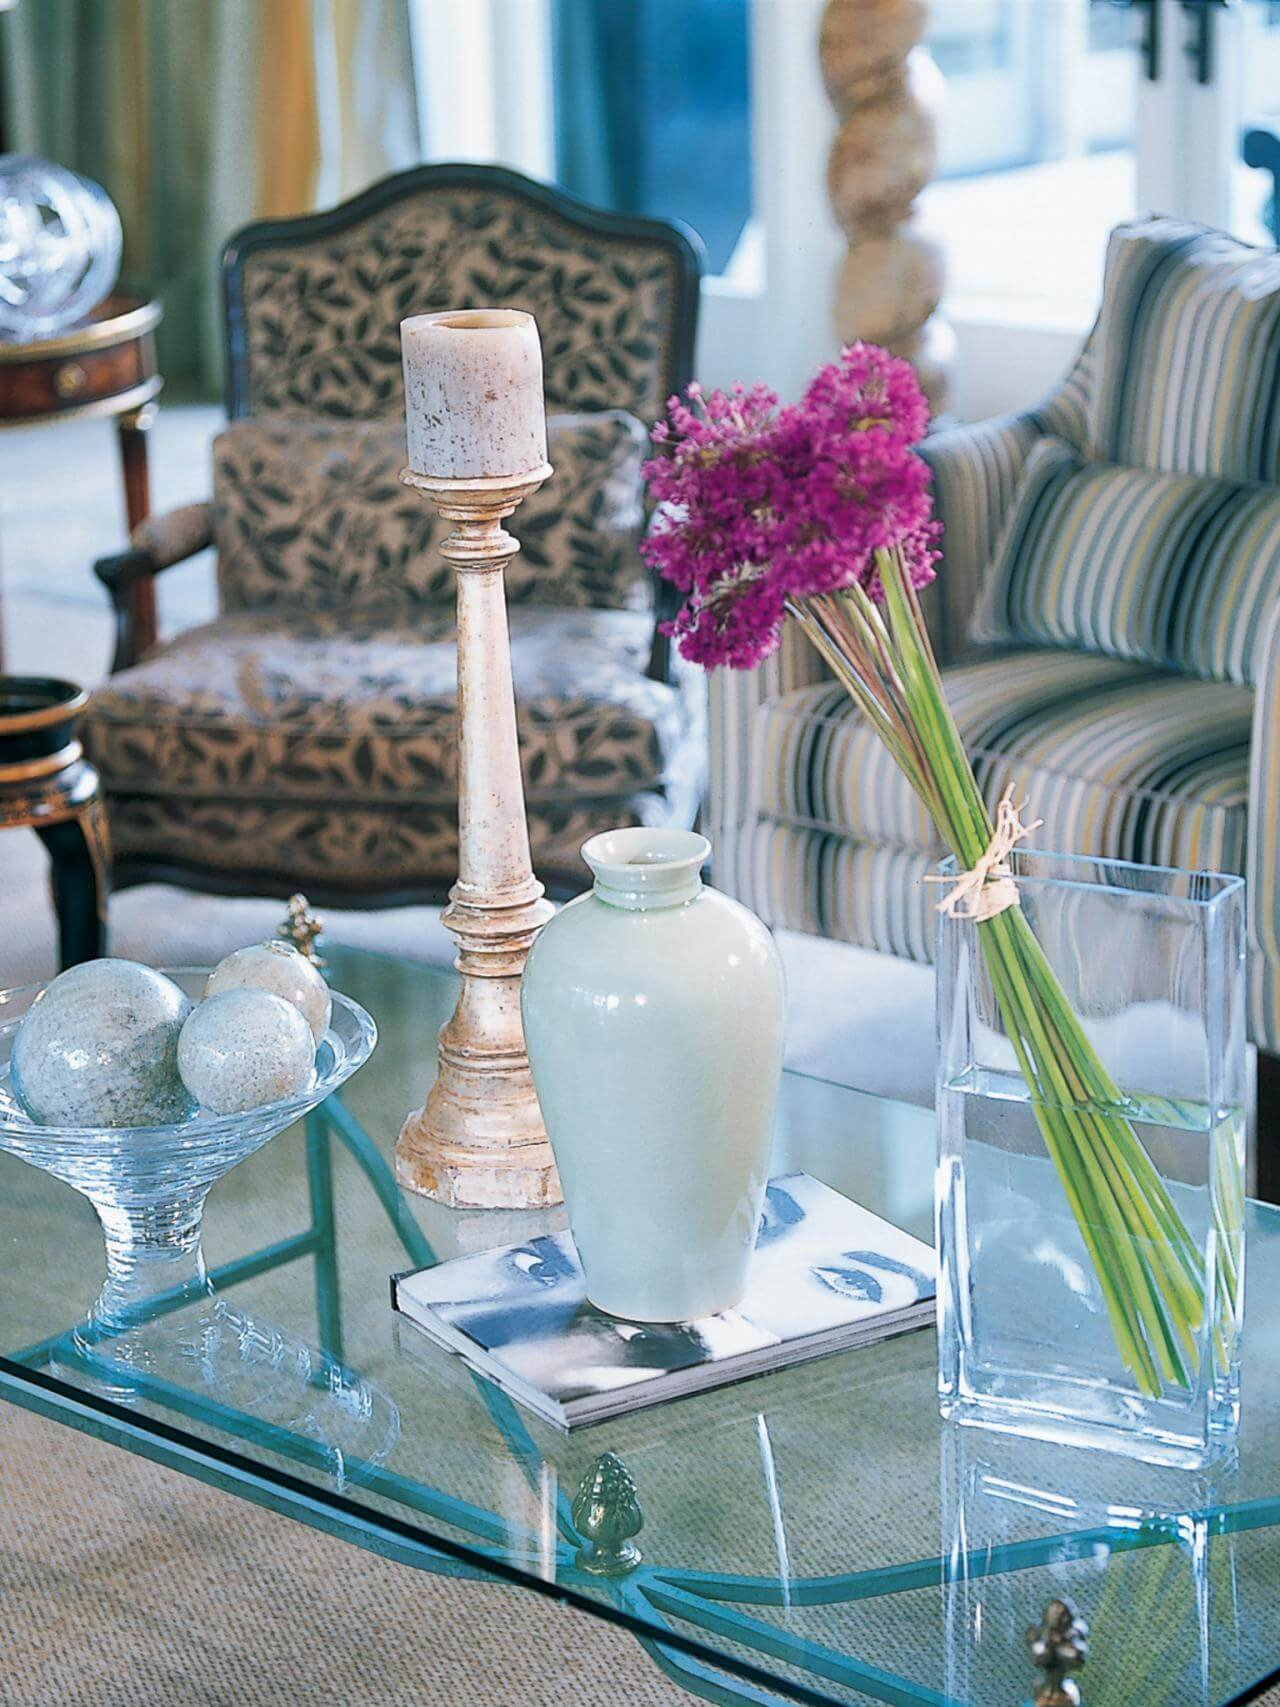 Glass Coffee Table Decor Ideas Inspirational 37 Best Coffee Table Decorating Ideas and Designs for 2019